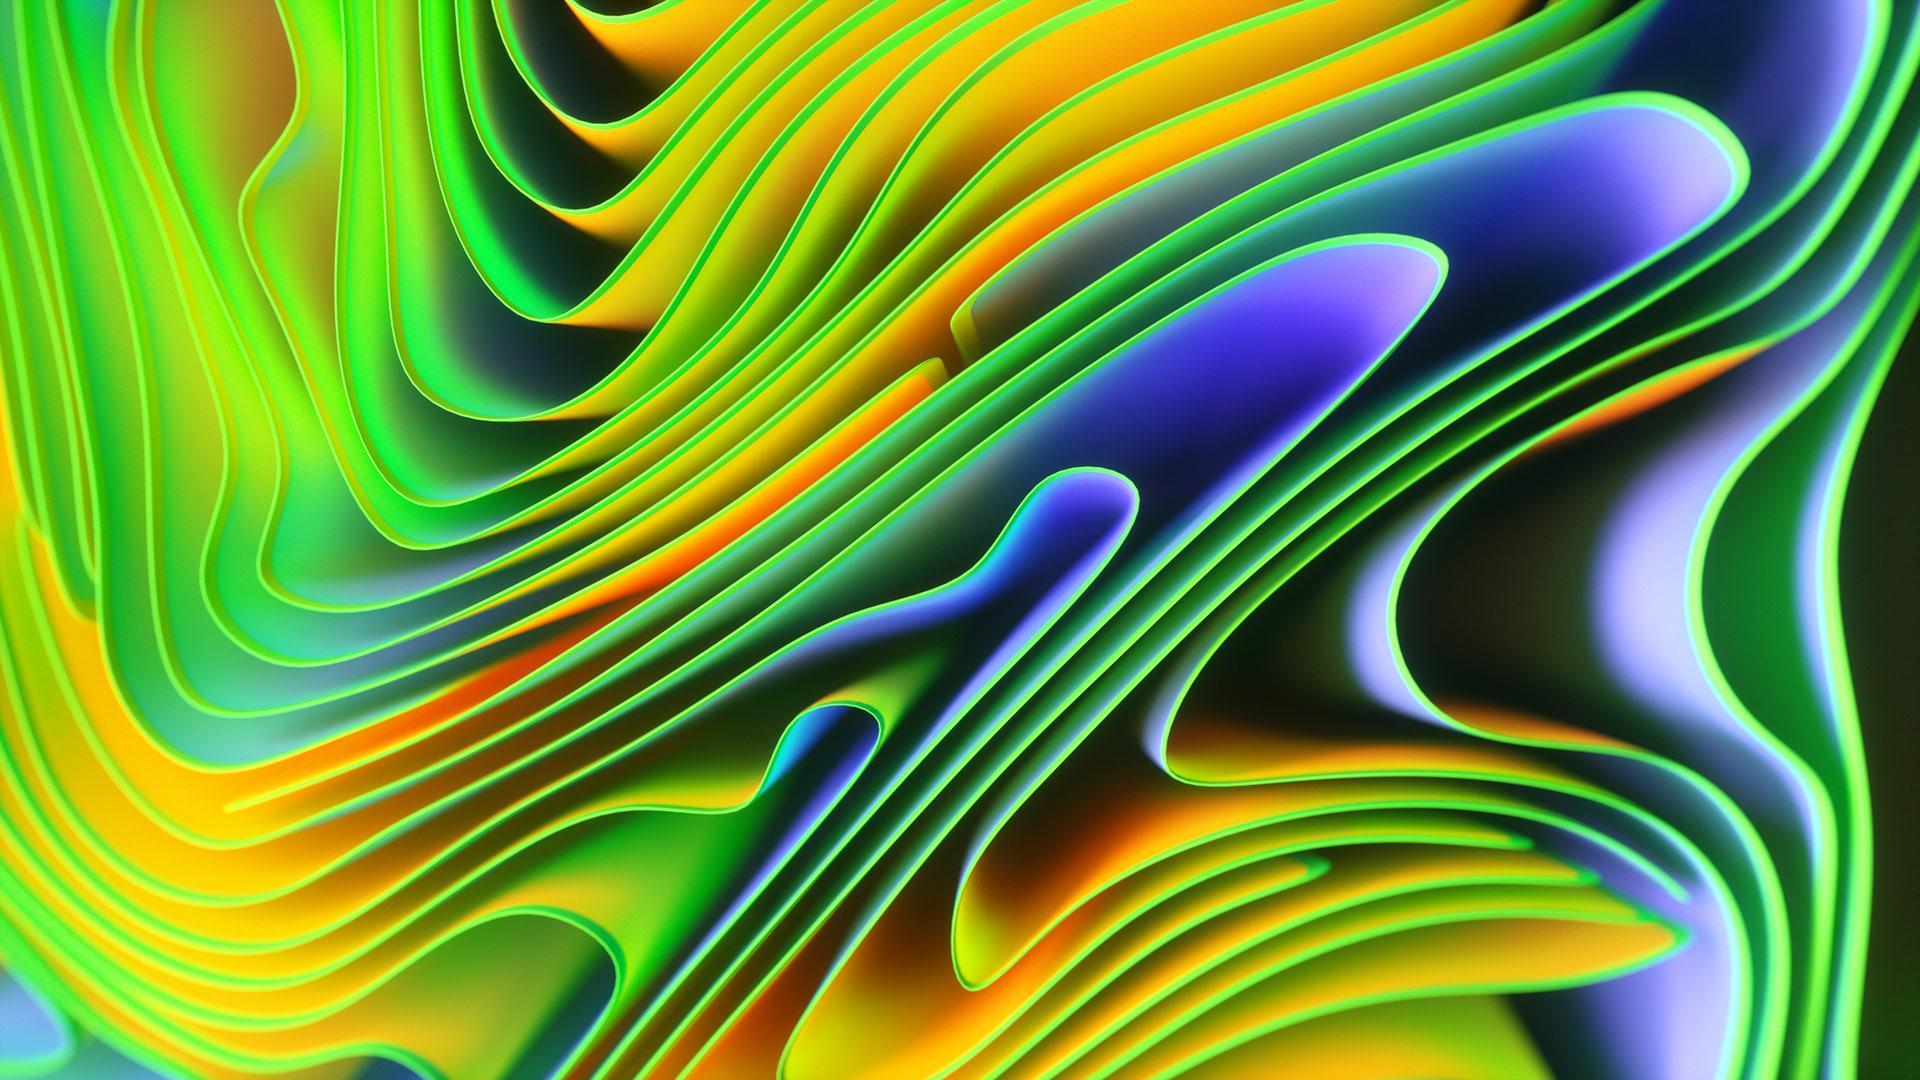 Twirl_01-1